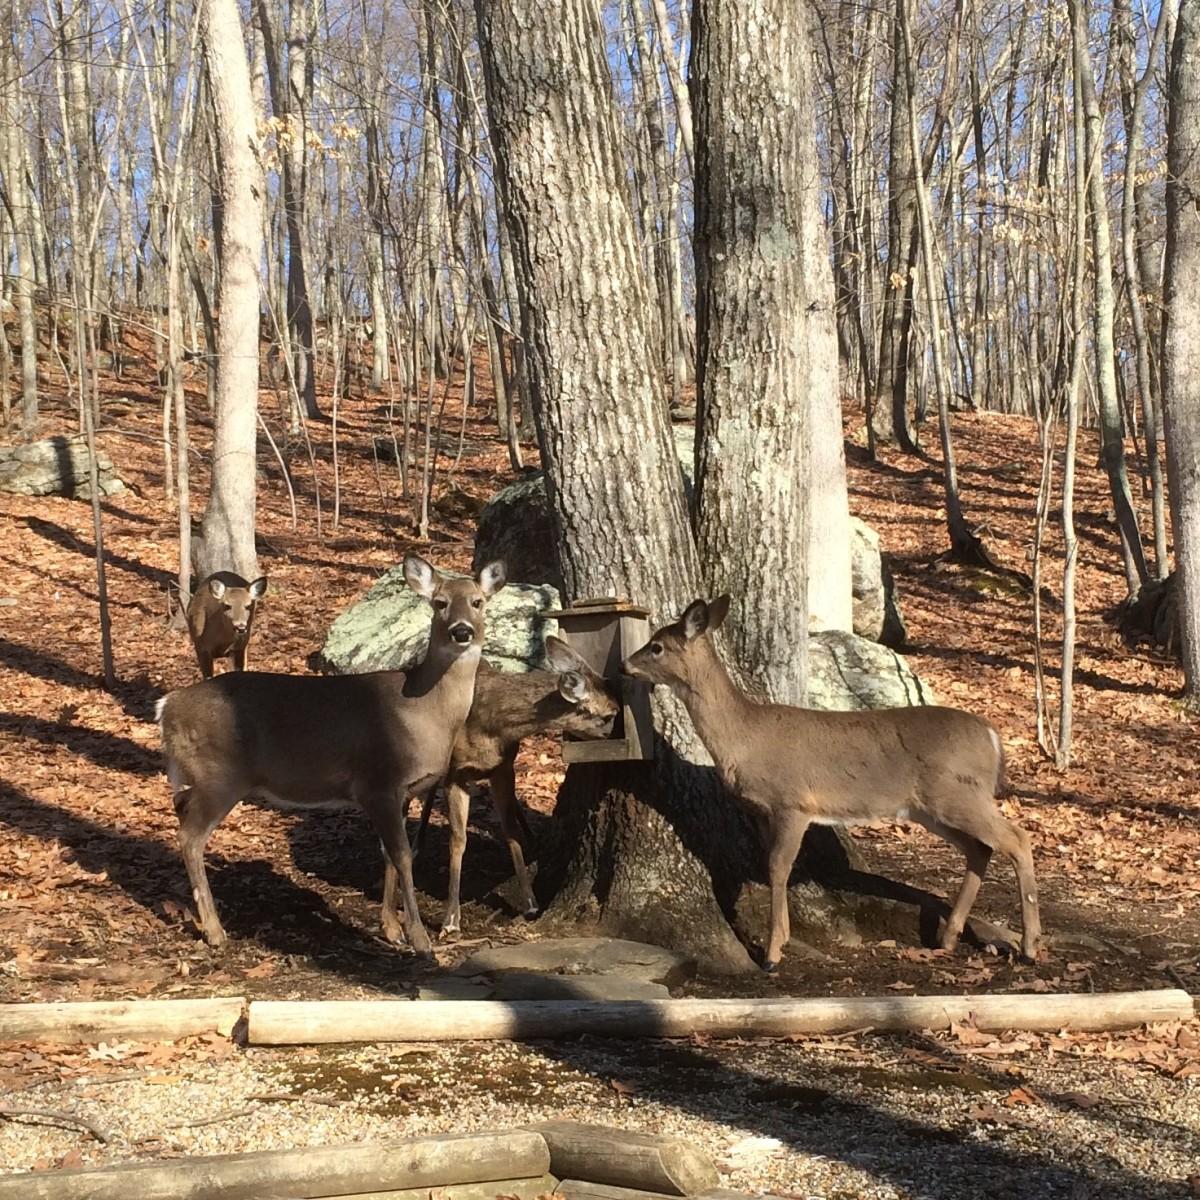 Visitors at the Deer Feeder